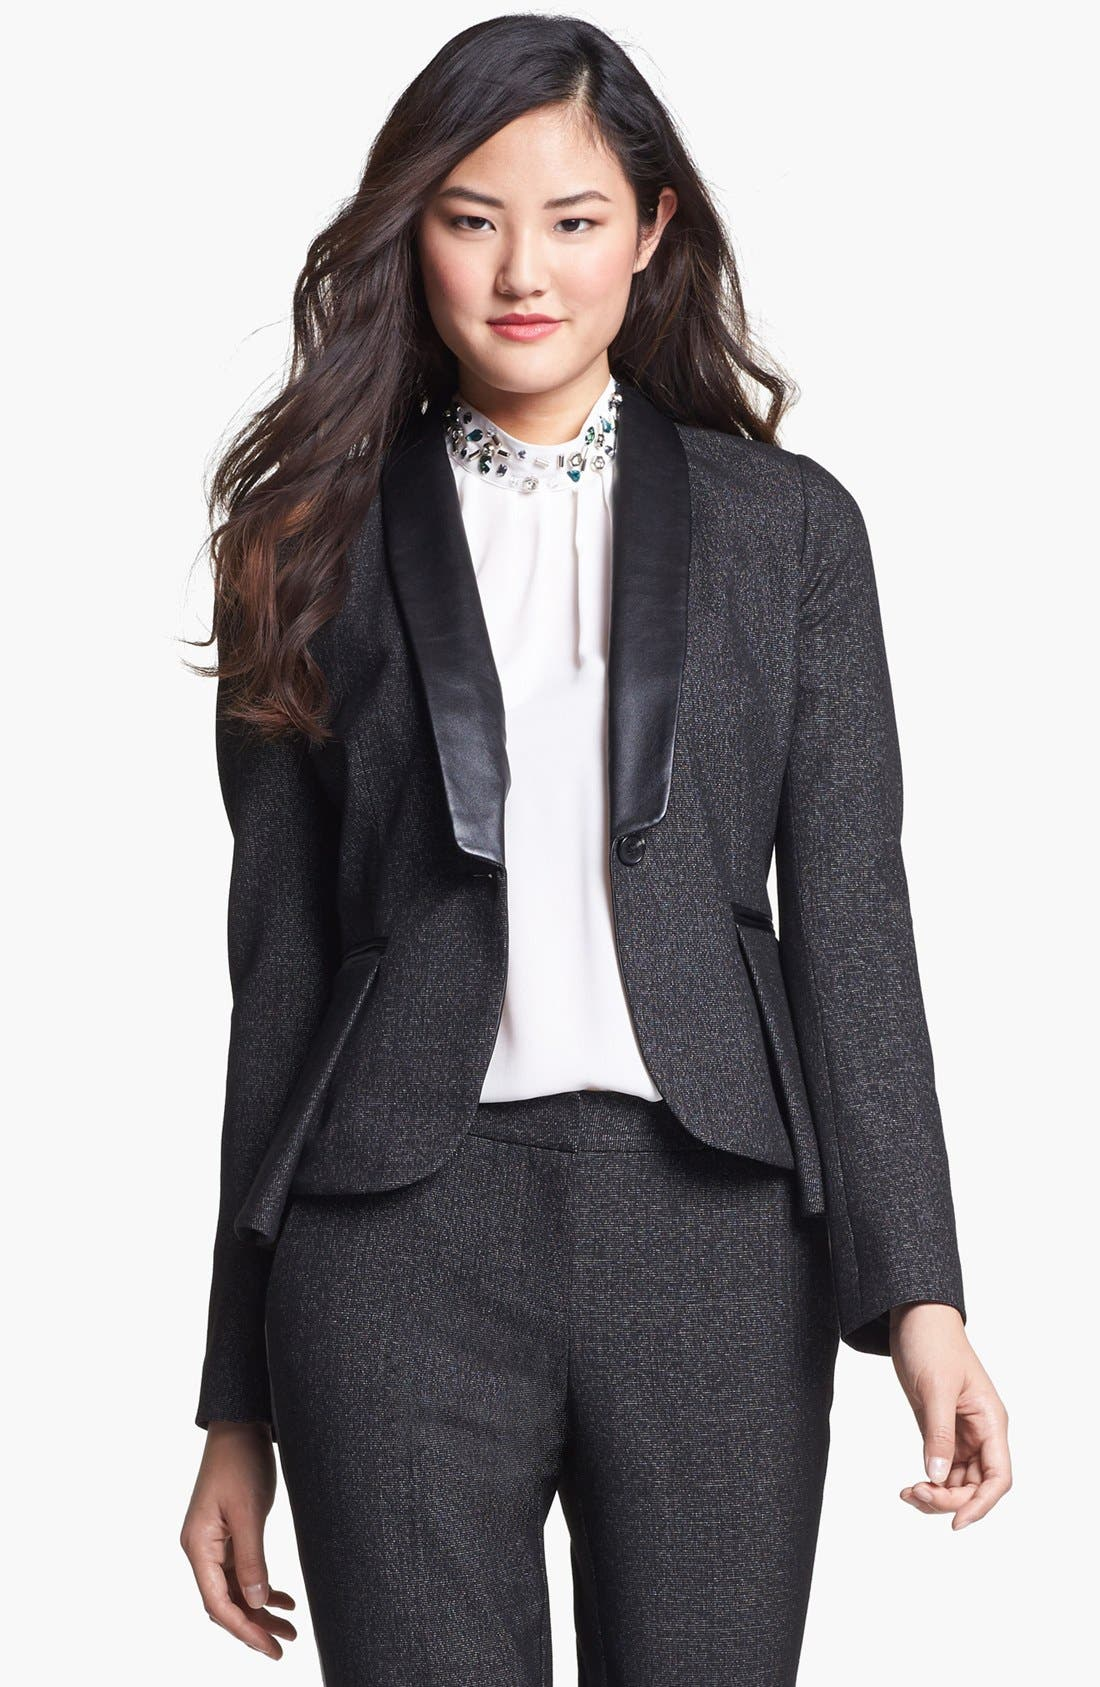 Alternate Image 1 Selected - Vince Camuto Faux Leather Collar Peplum Blazer